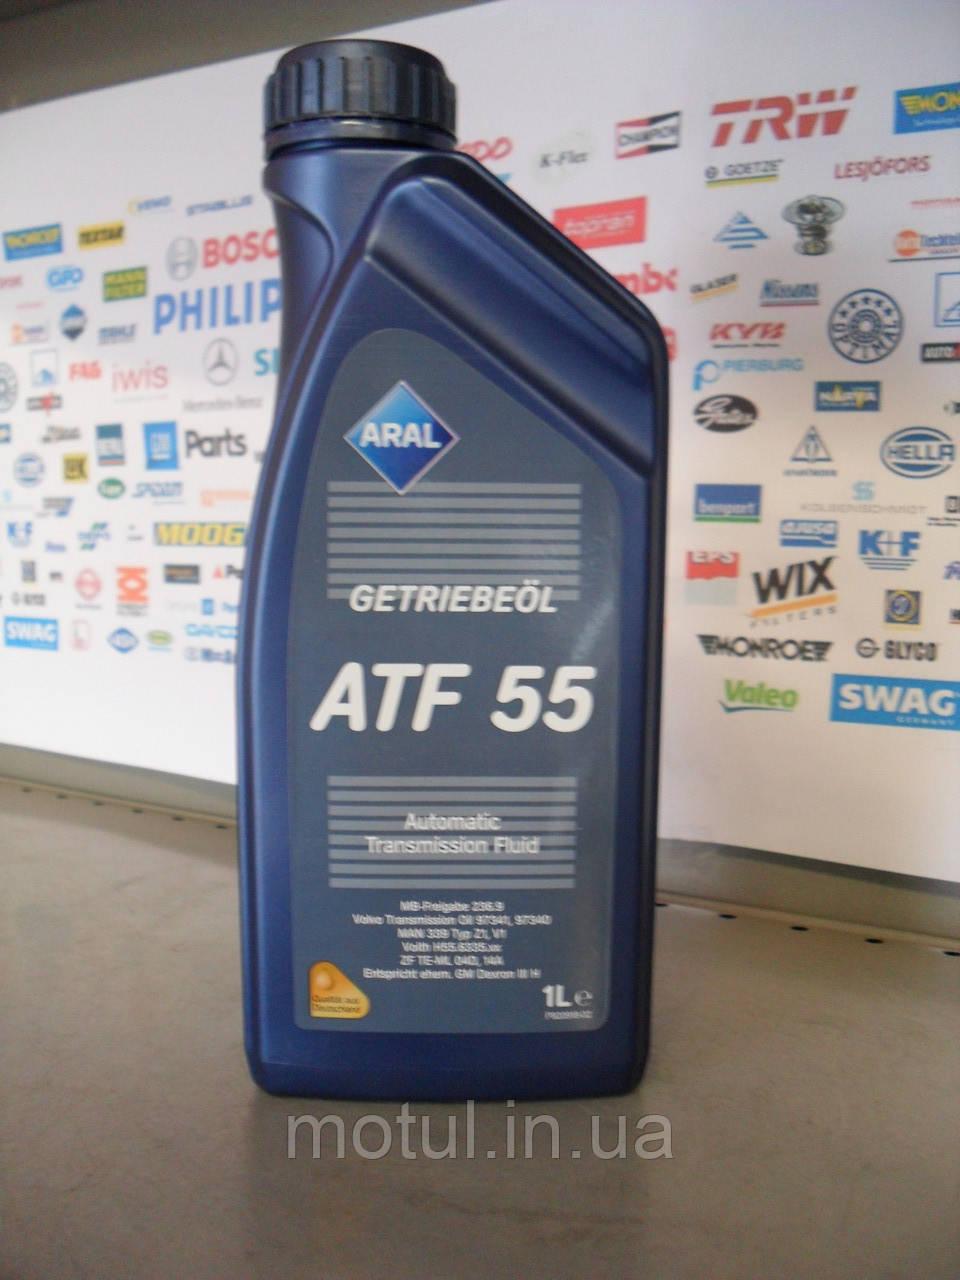 Трансмісійне масло Aral Atf 55